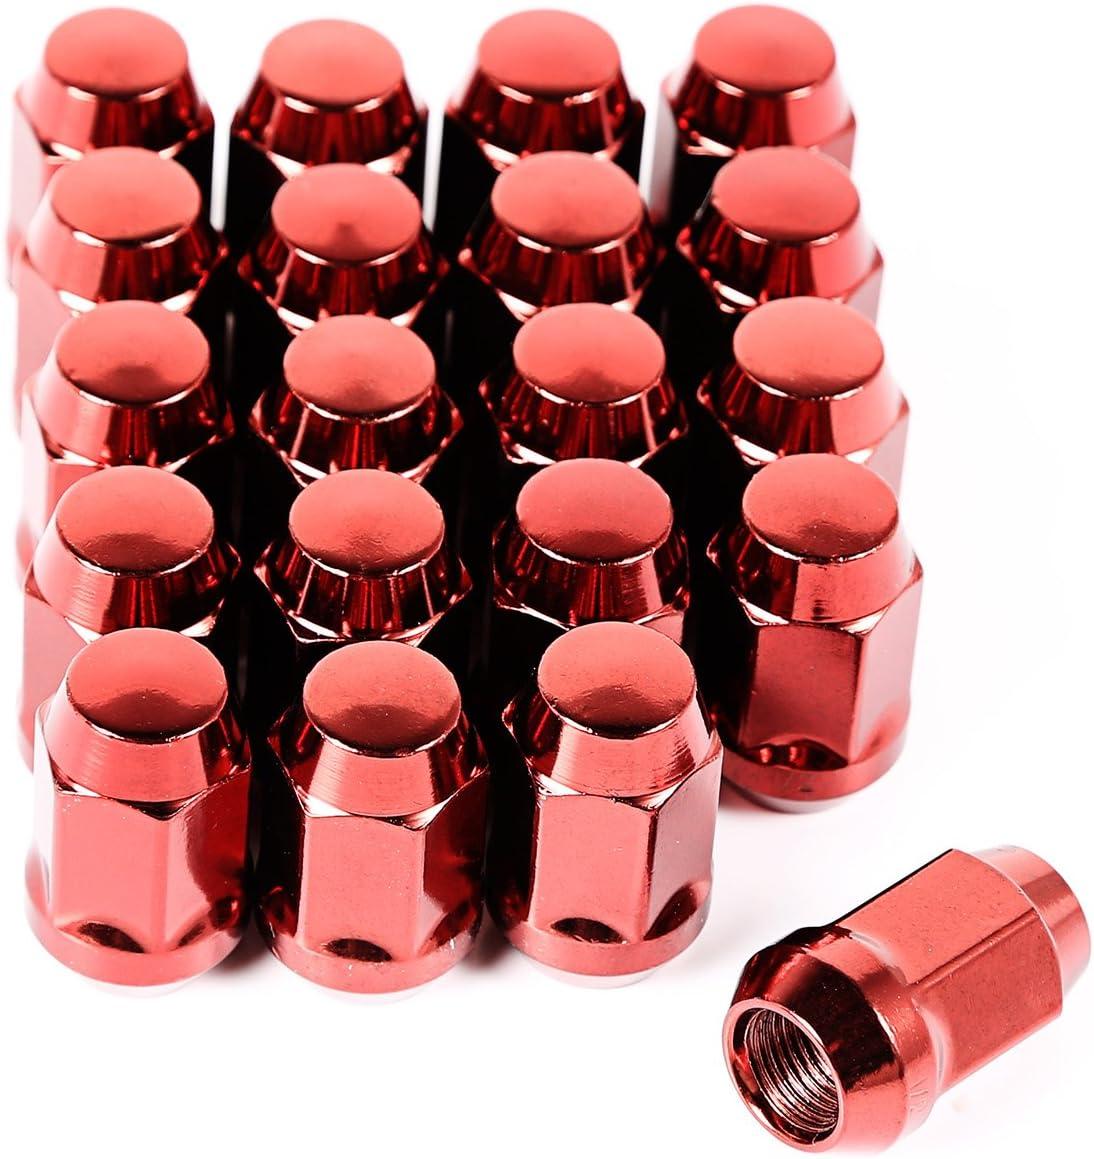 Wheel Lug Nut Set of 20 Red 1//2-20 x 16715.24